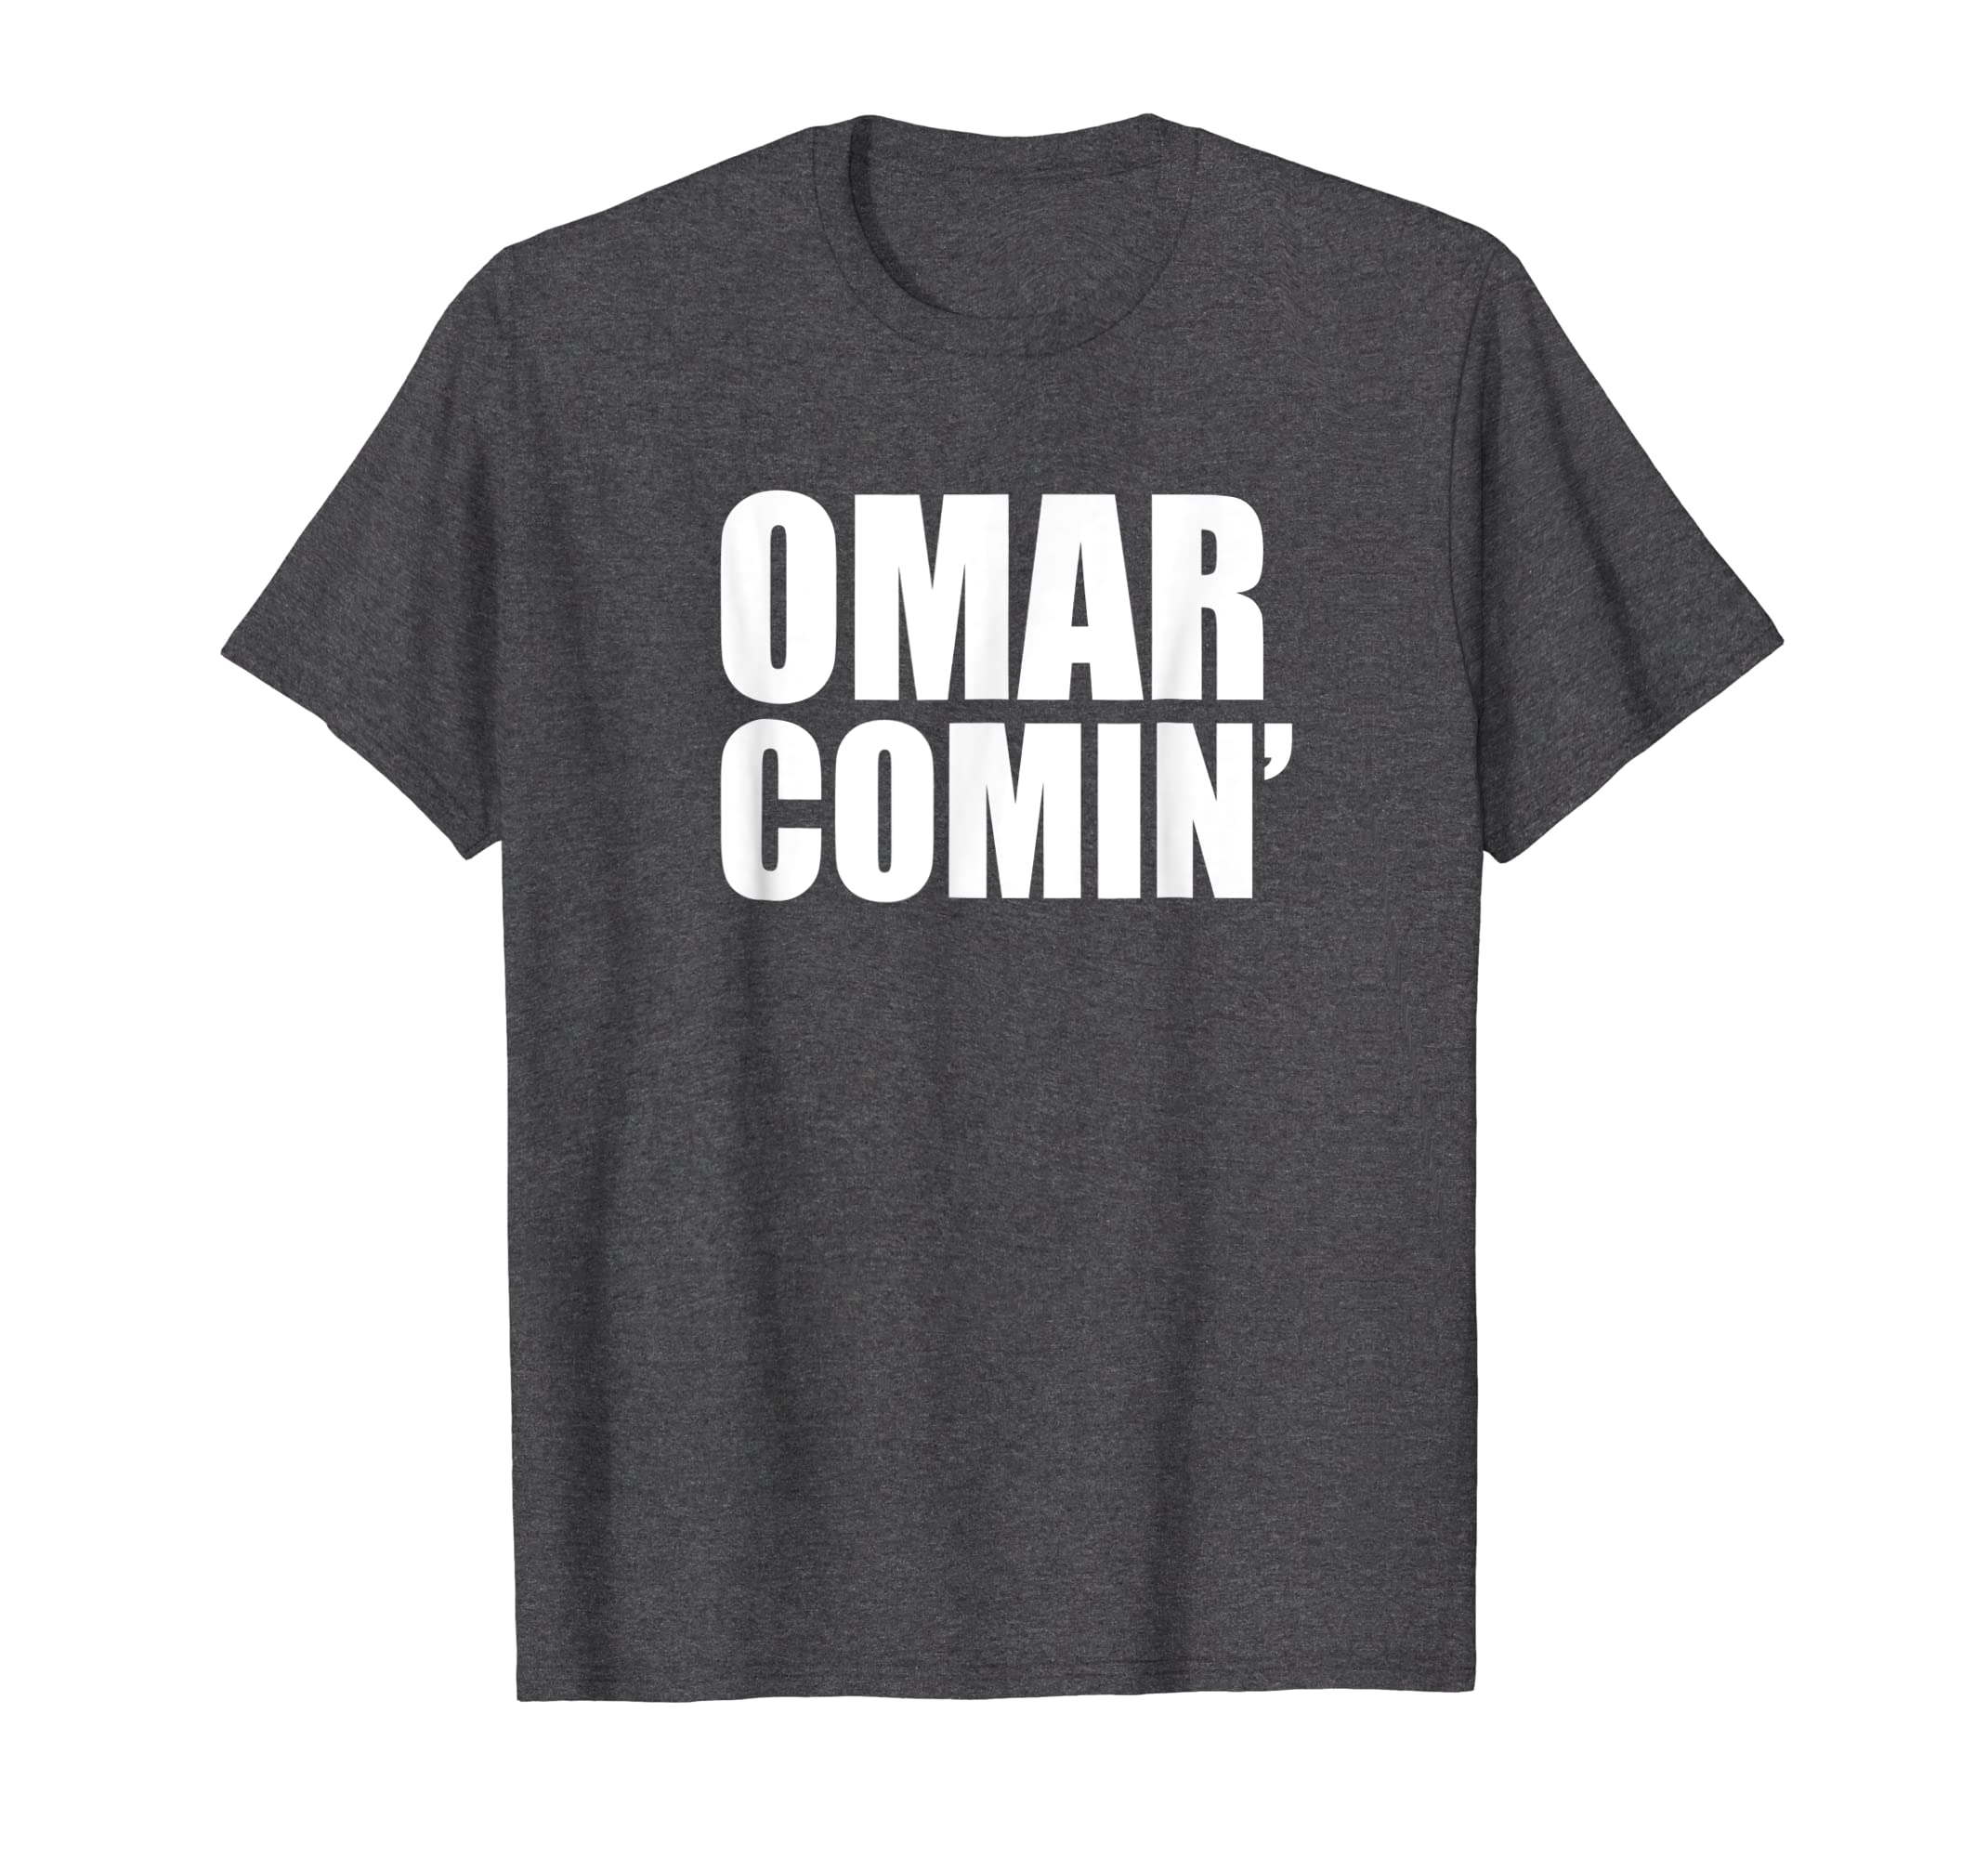 Amazon.com: Omar Comin T-Shirt - Omar Comin\' Tee Shirt: Clothing